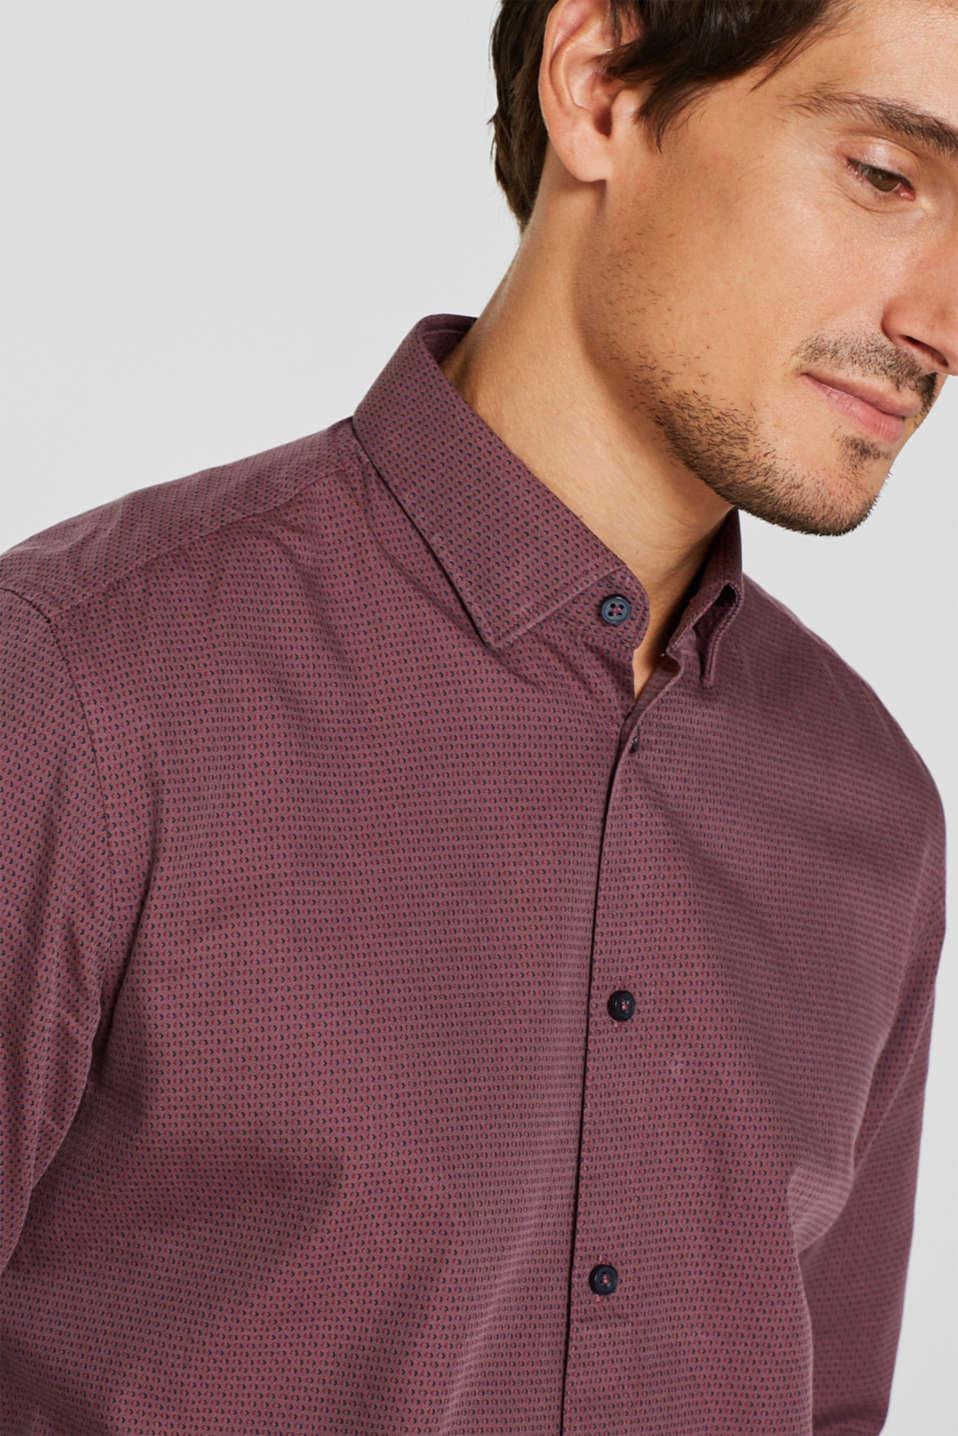 Shirts woven Slim fit, GARNET RED, detail image number 2